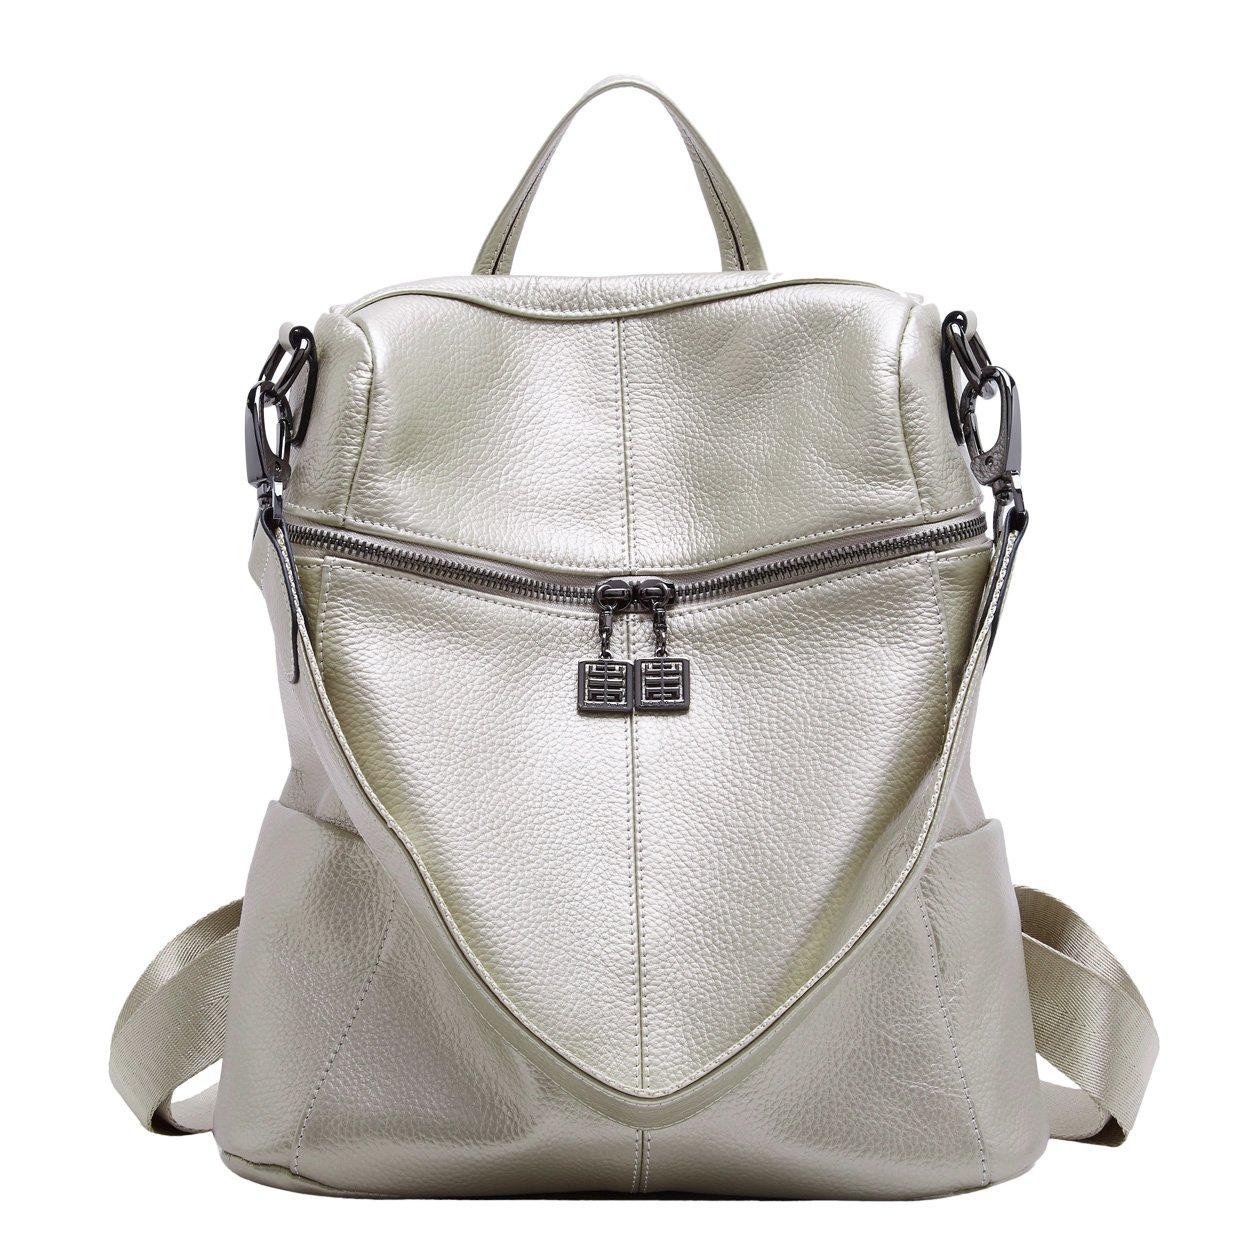 BOYATU Convertible Genuine Leather Backpack Purse for Women Fashion Travel Bag